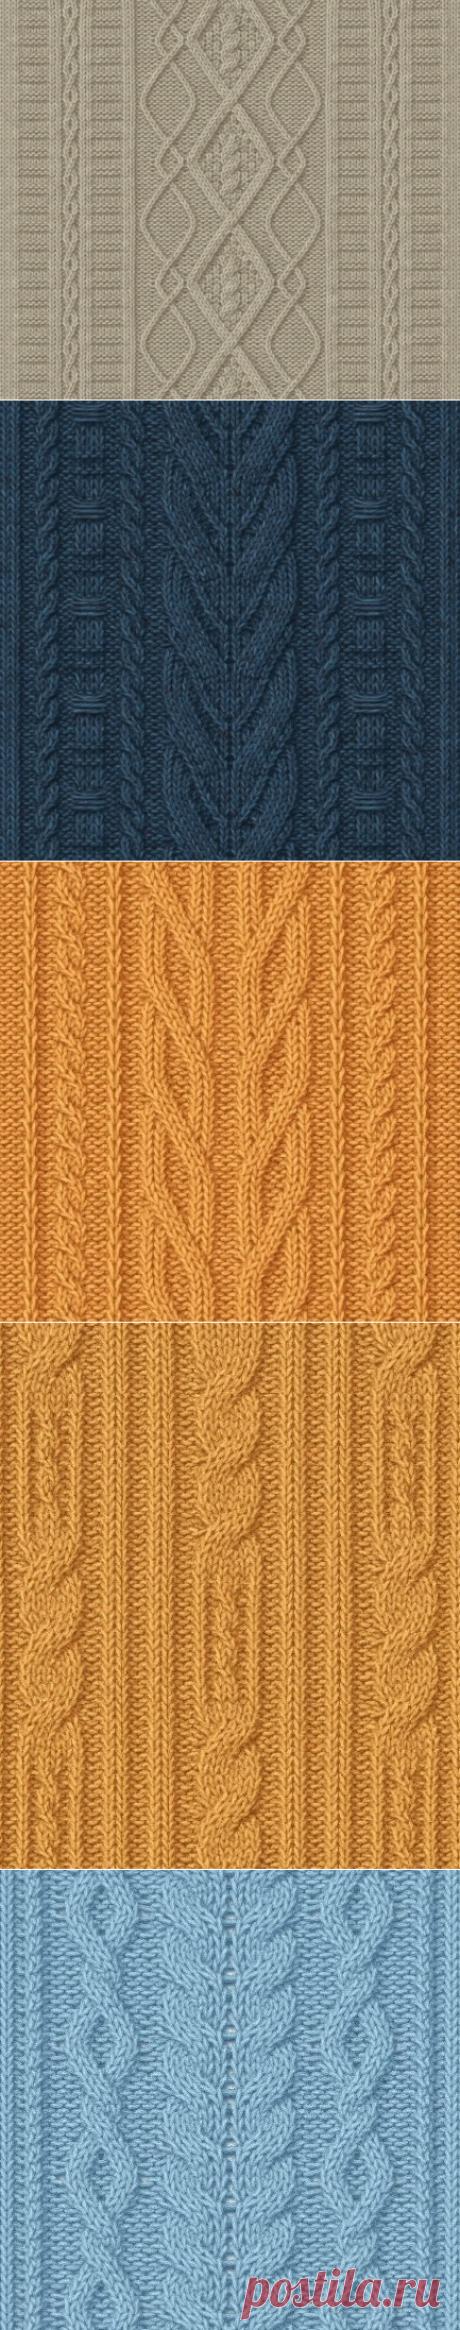 Узоры с косами (араны)